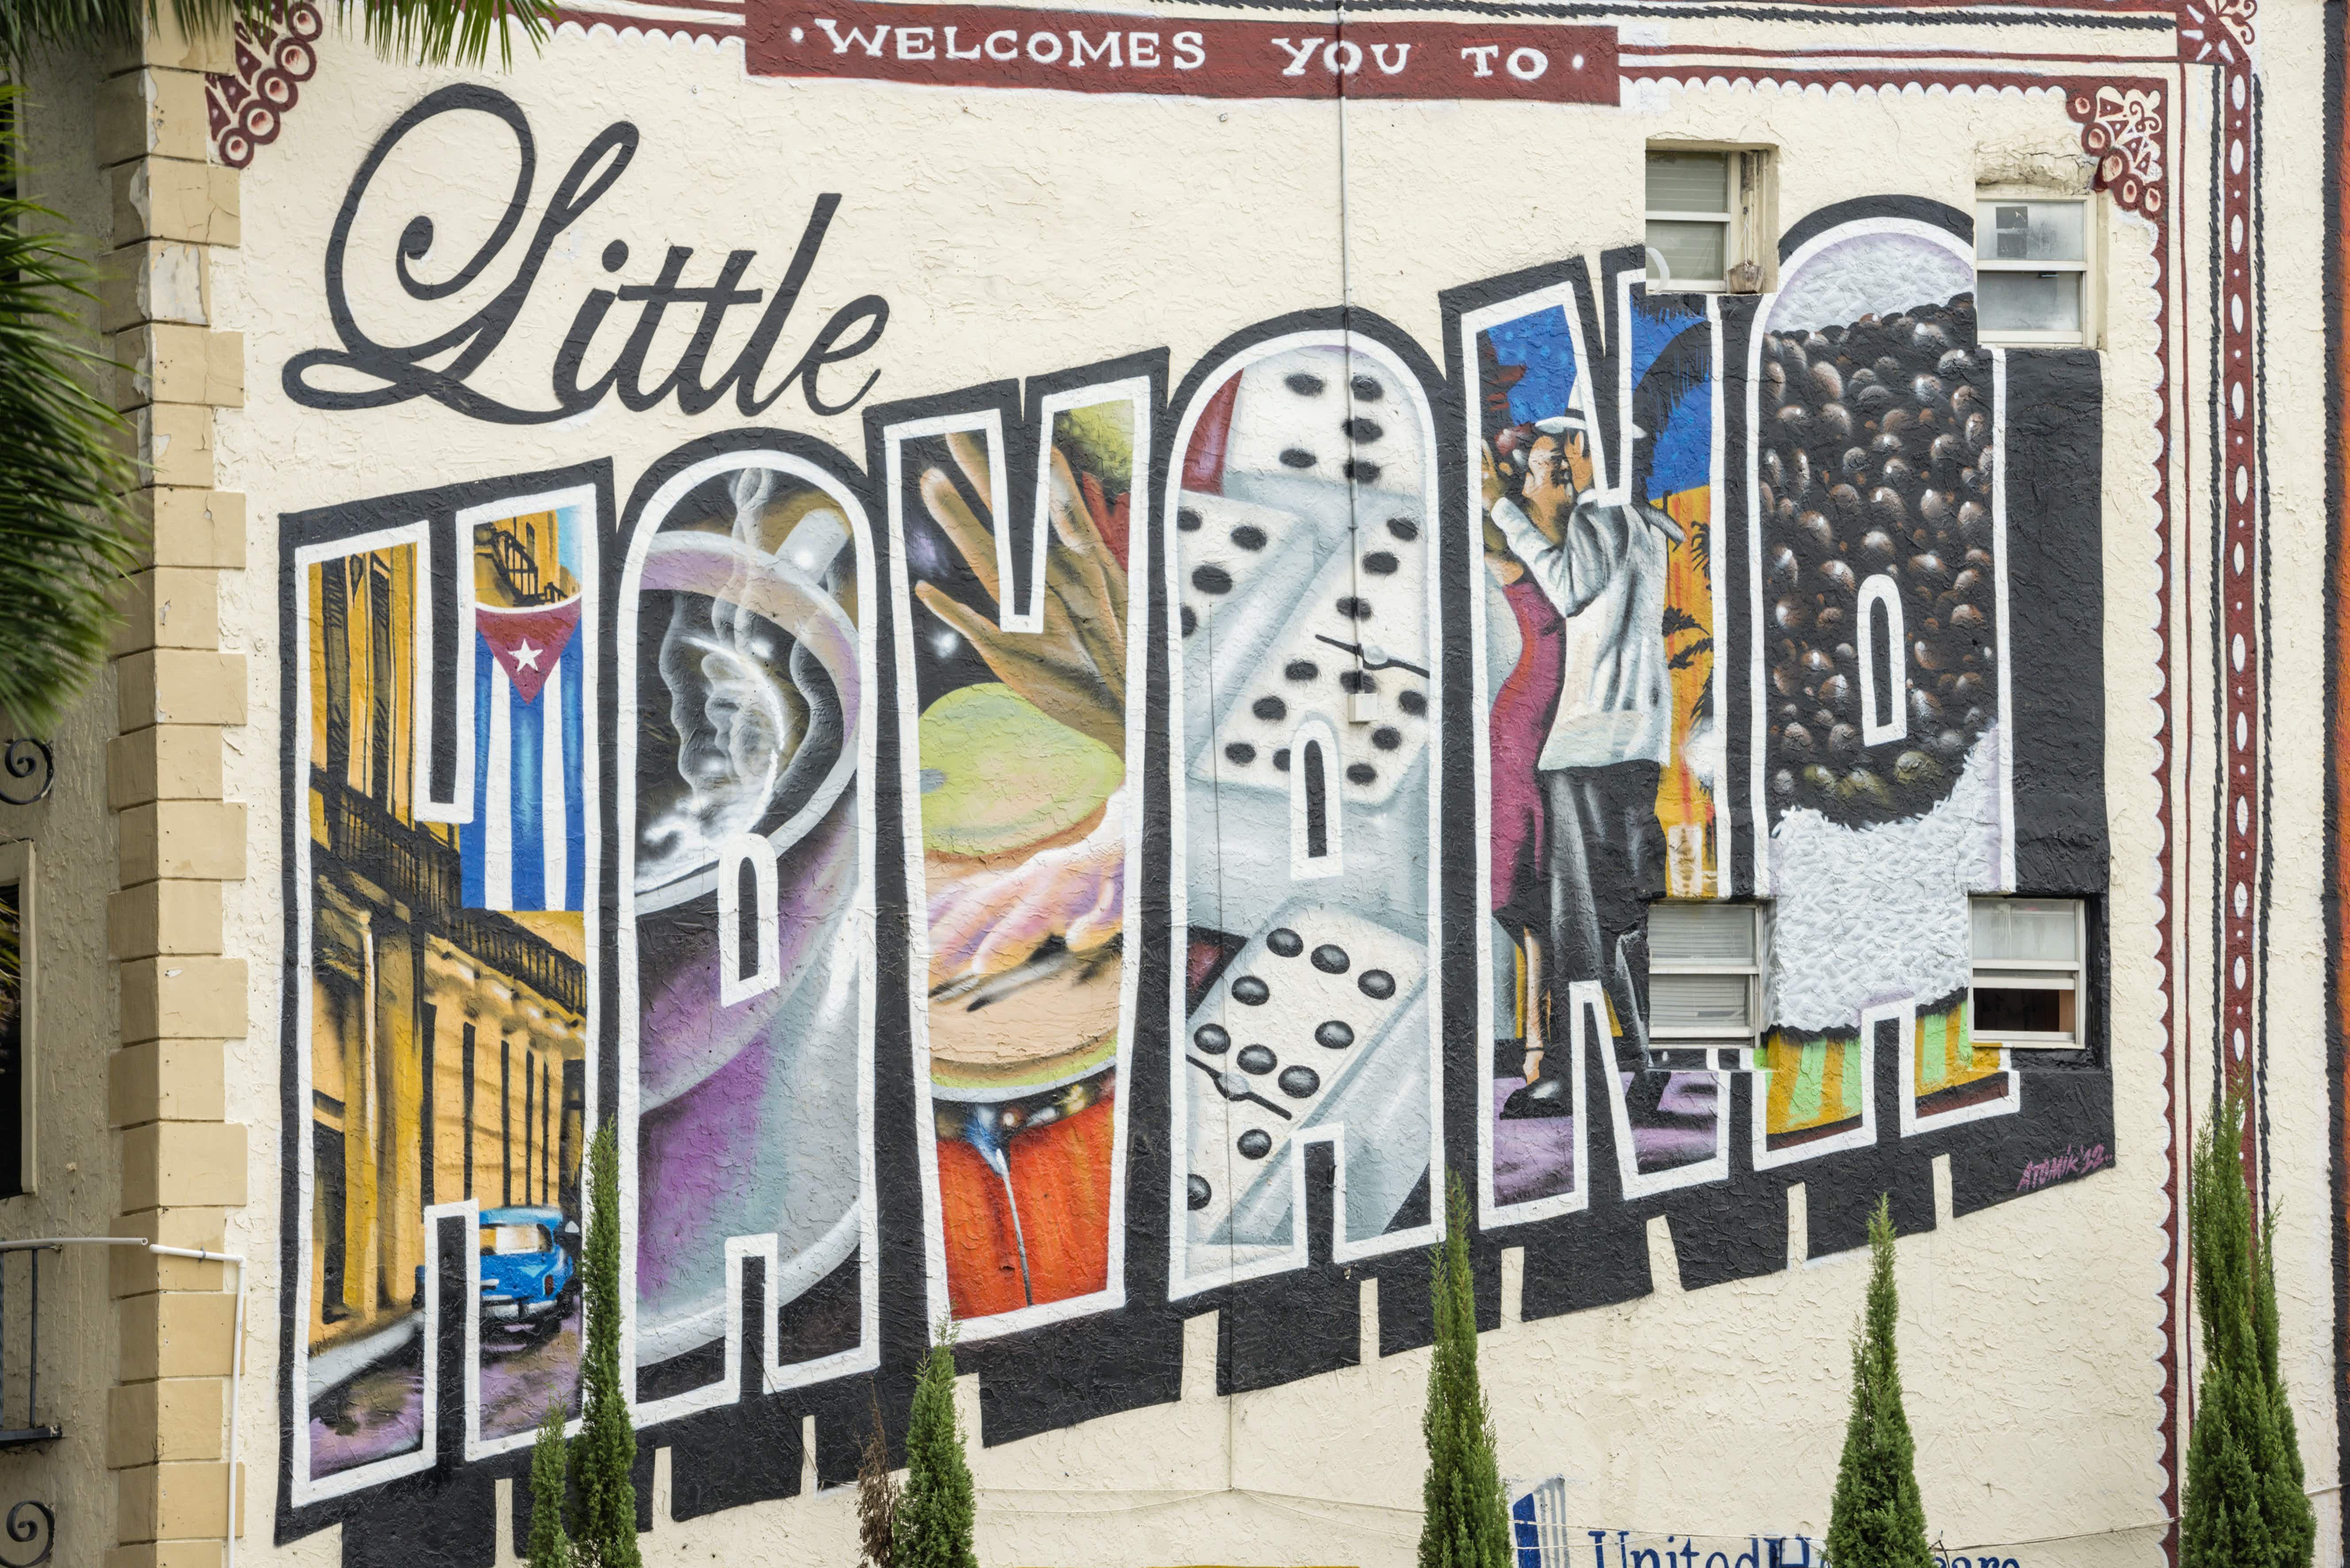 Miami's Little Havana neighbourhood is getting its very own museum